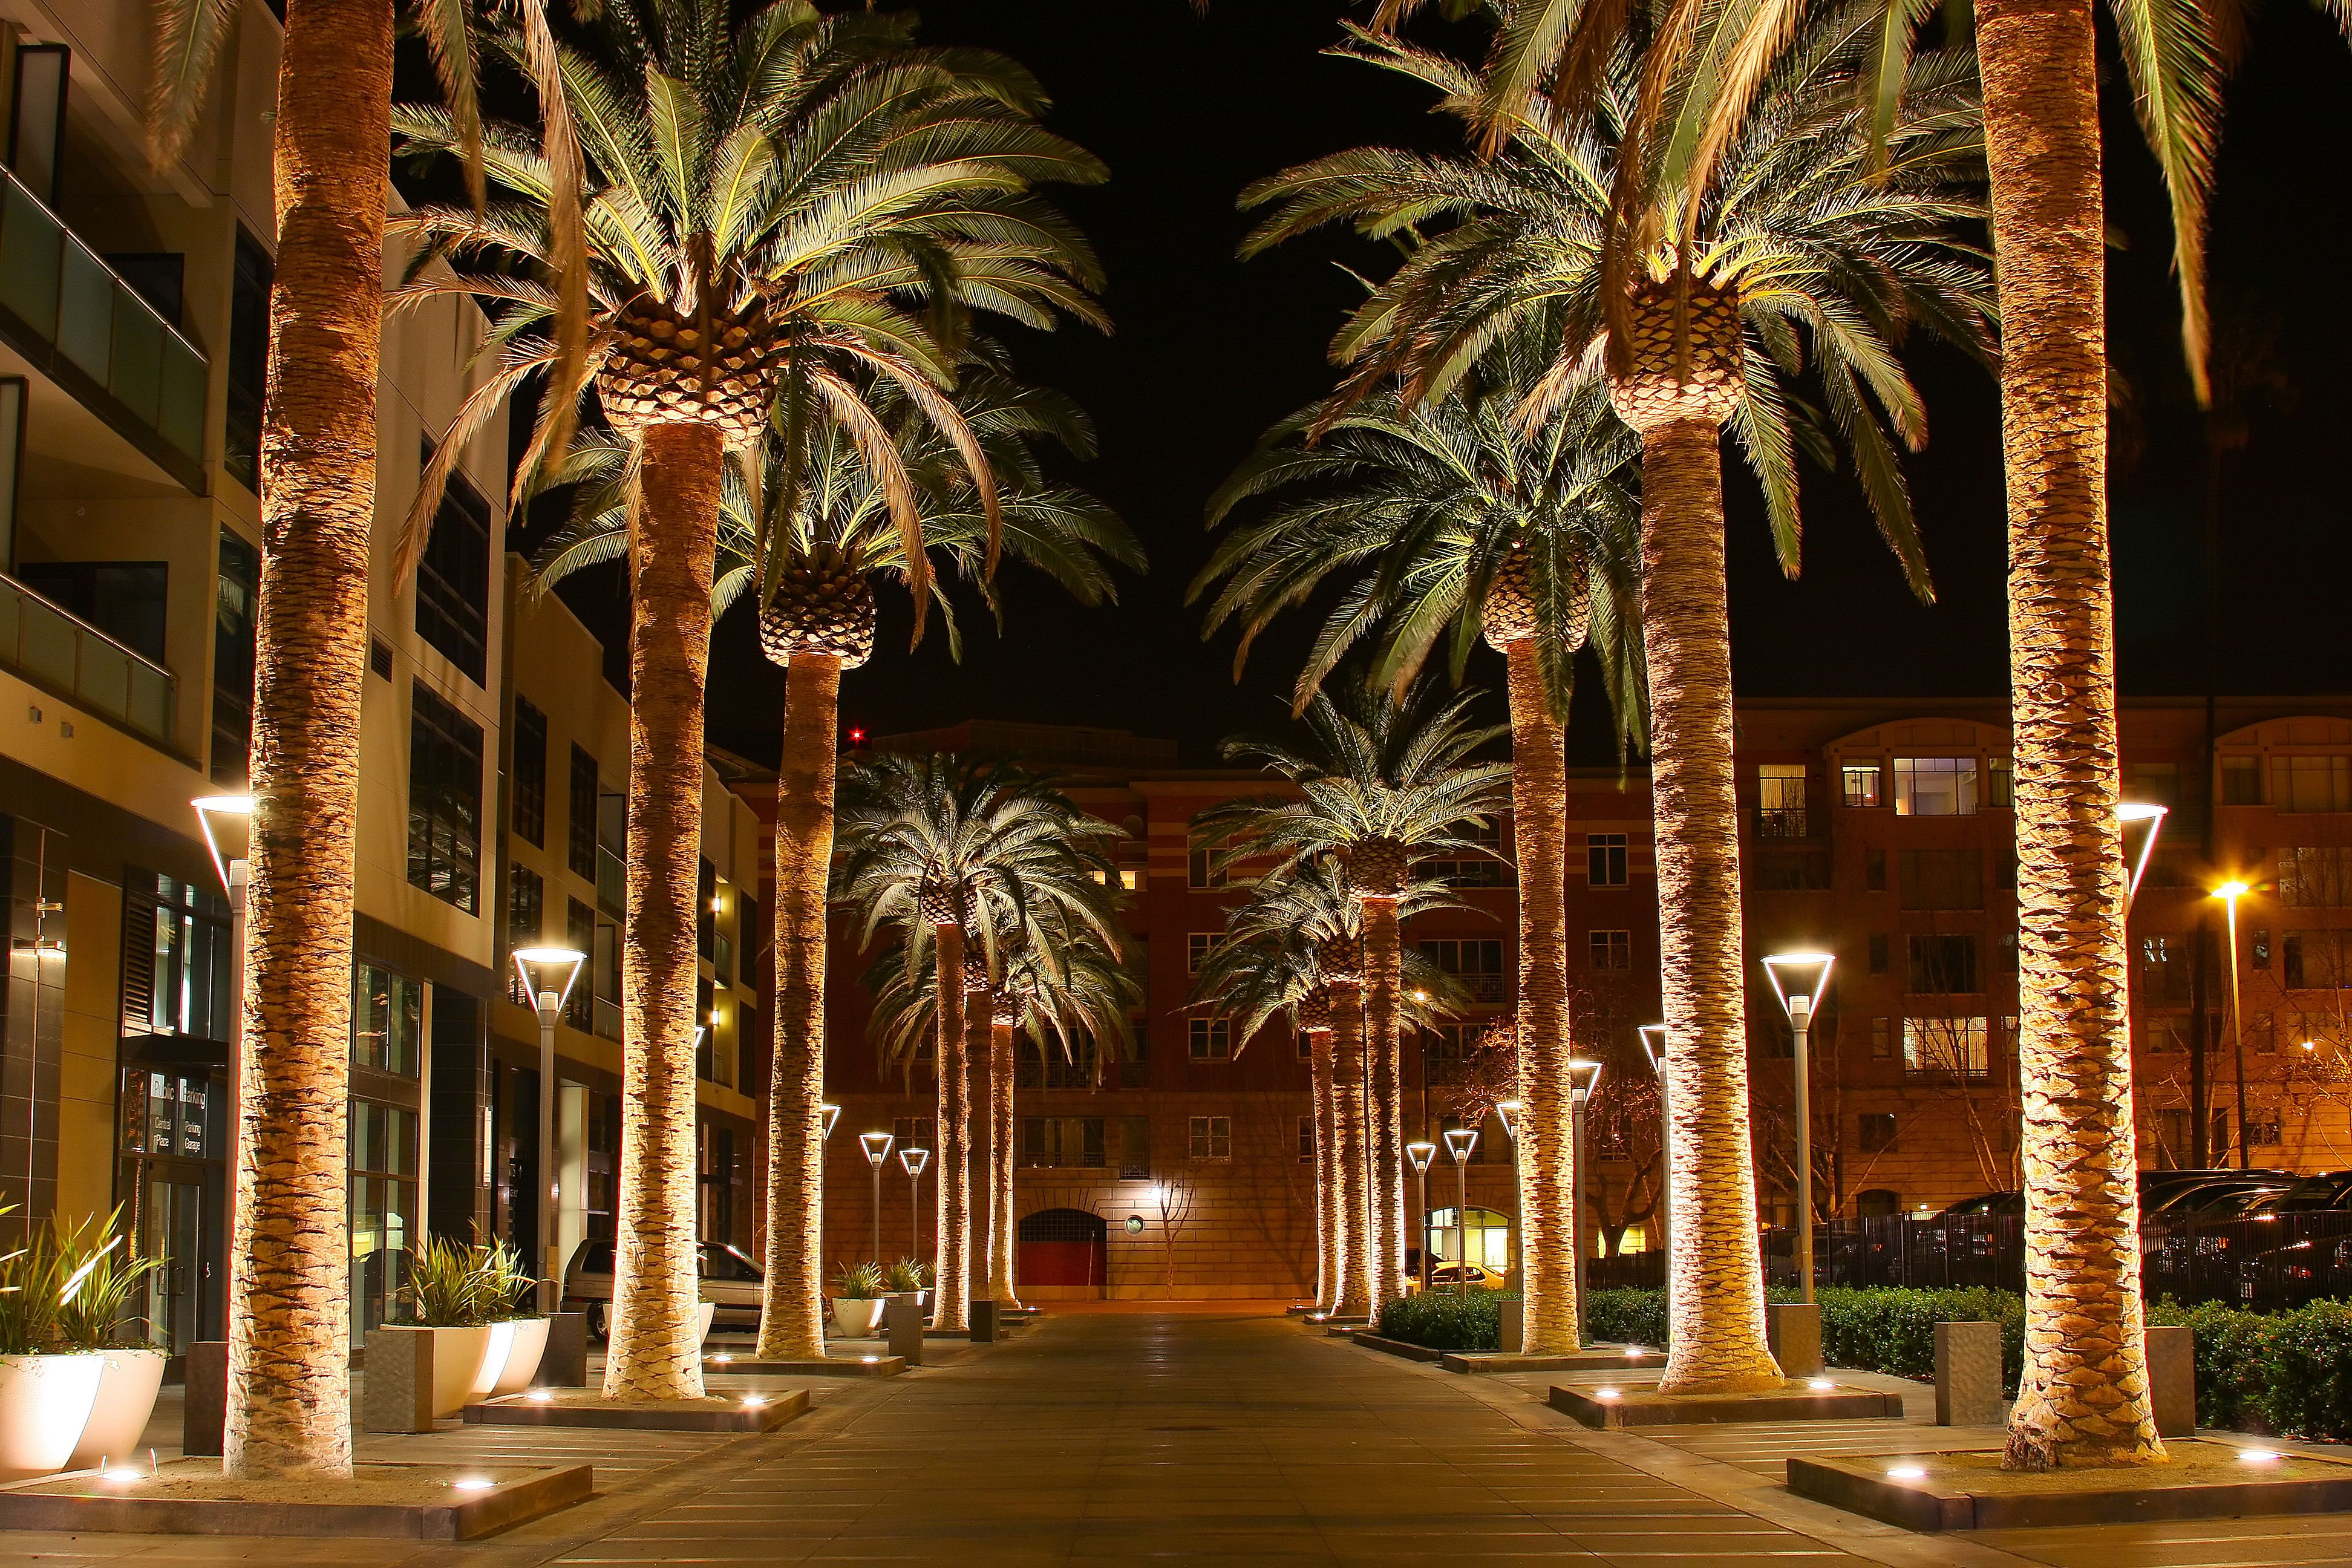 10 Things to Do in San Jose, California